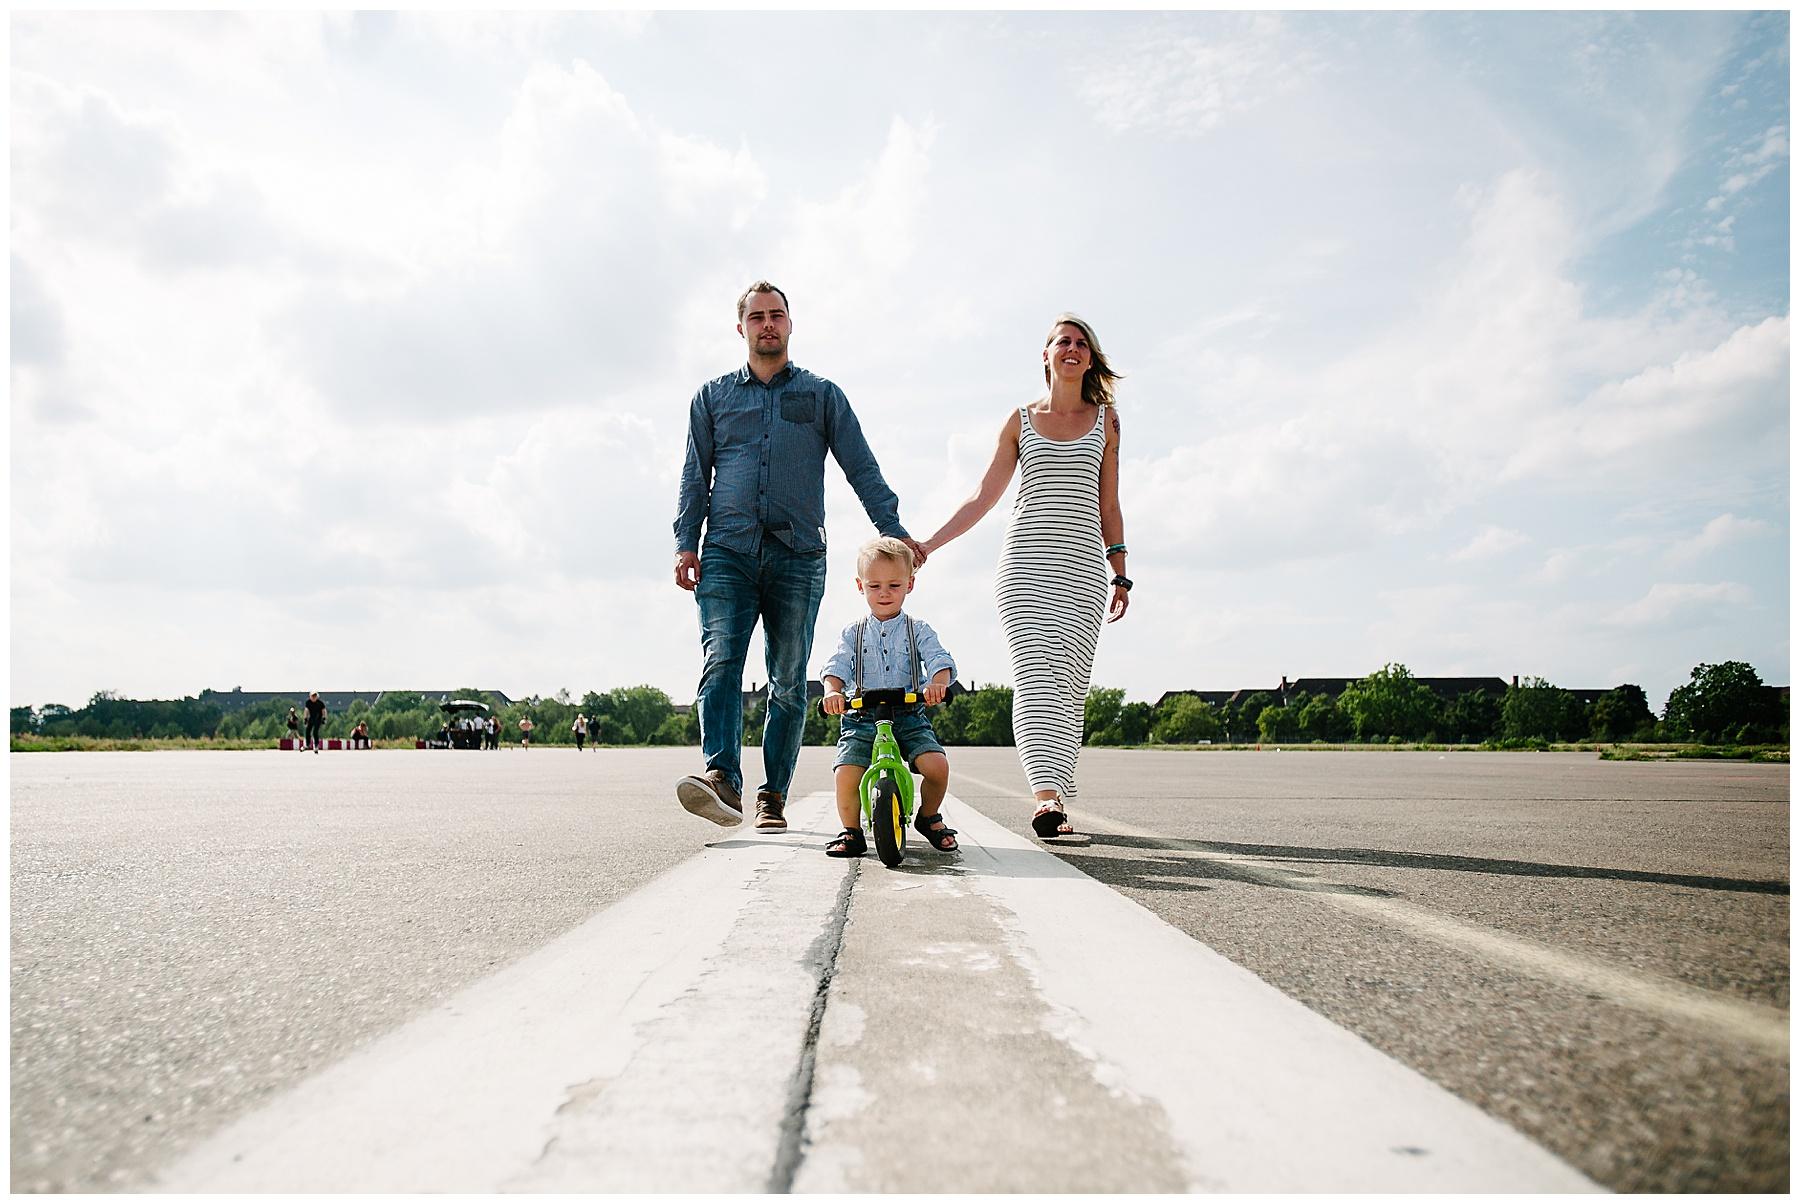 Familienfotograf Boris Mehl aus Berlin